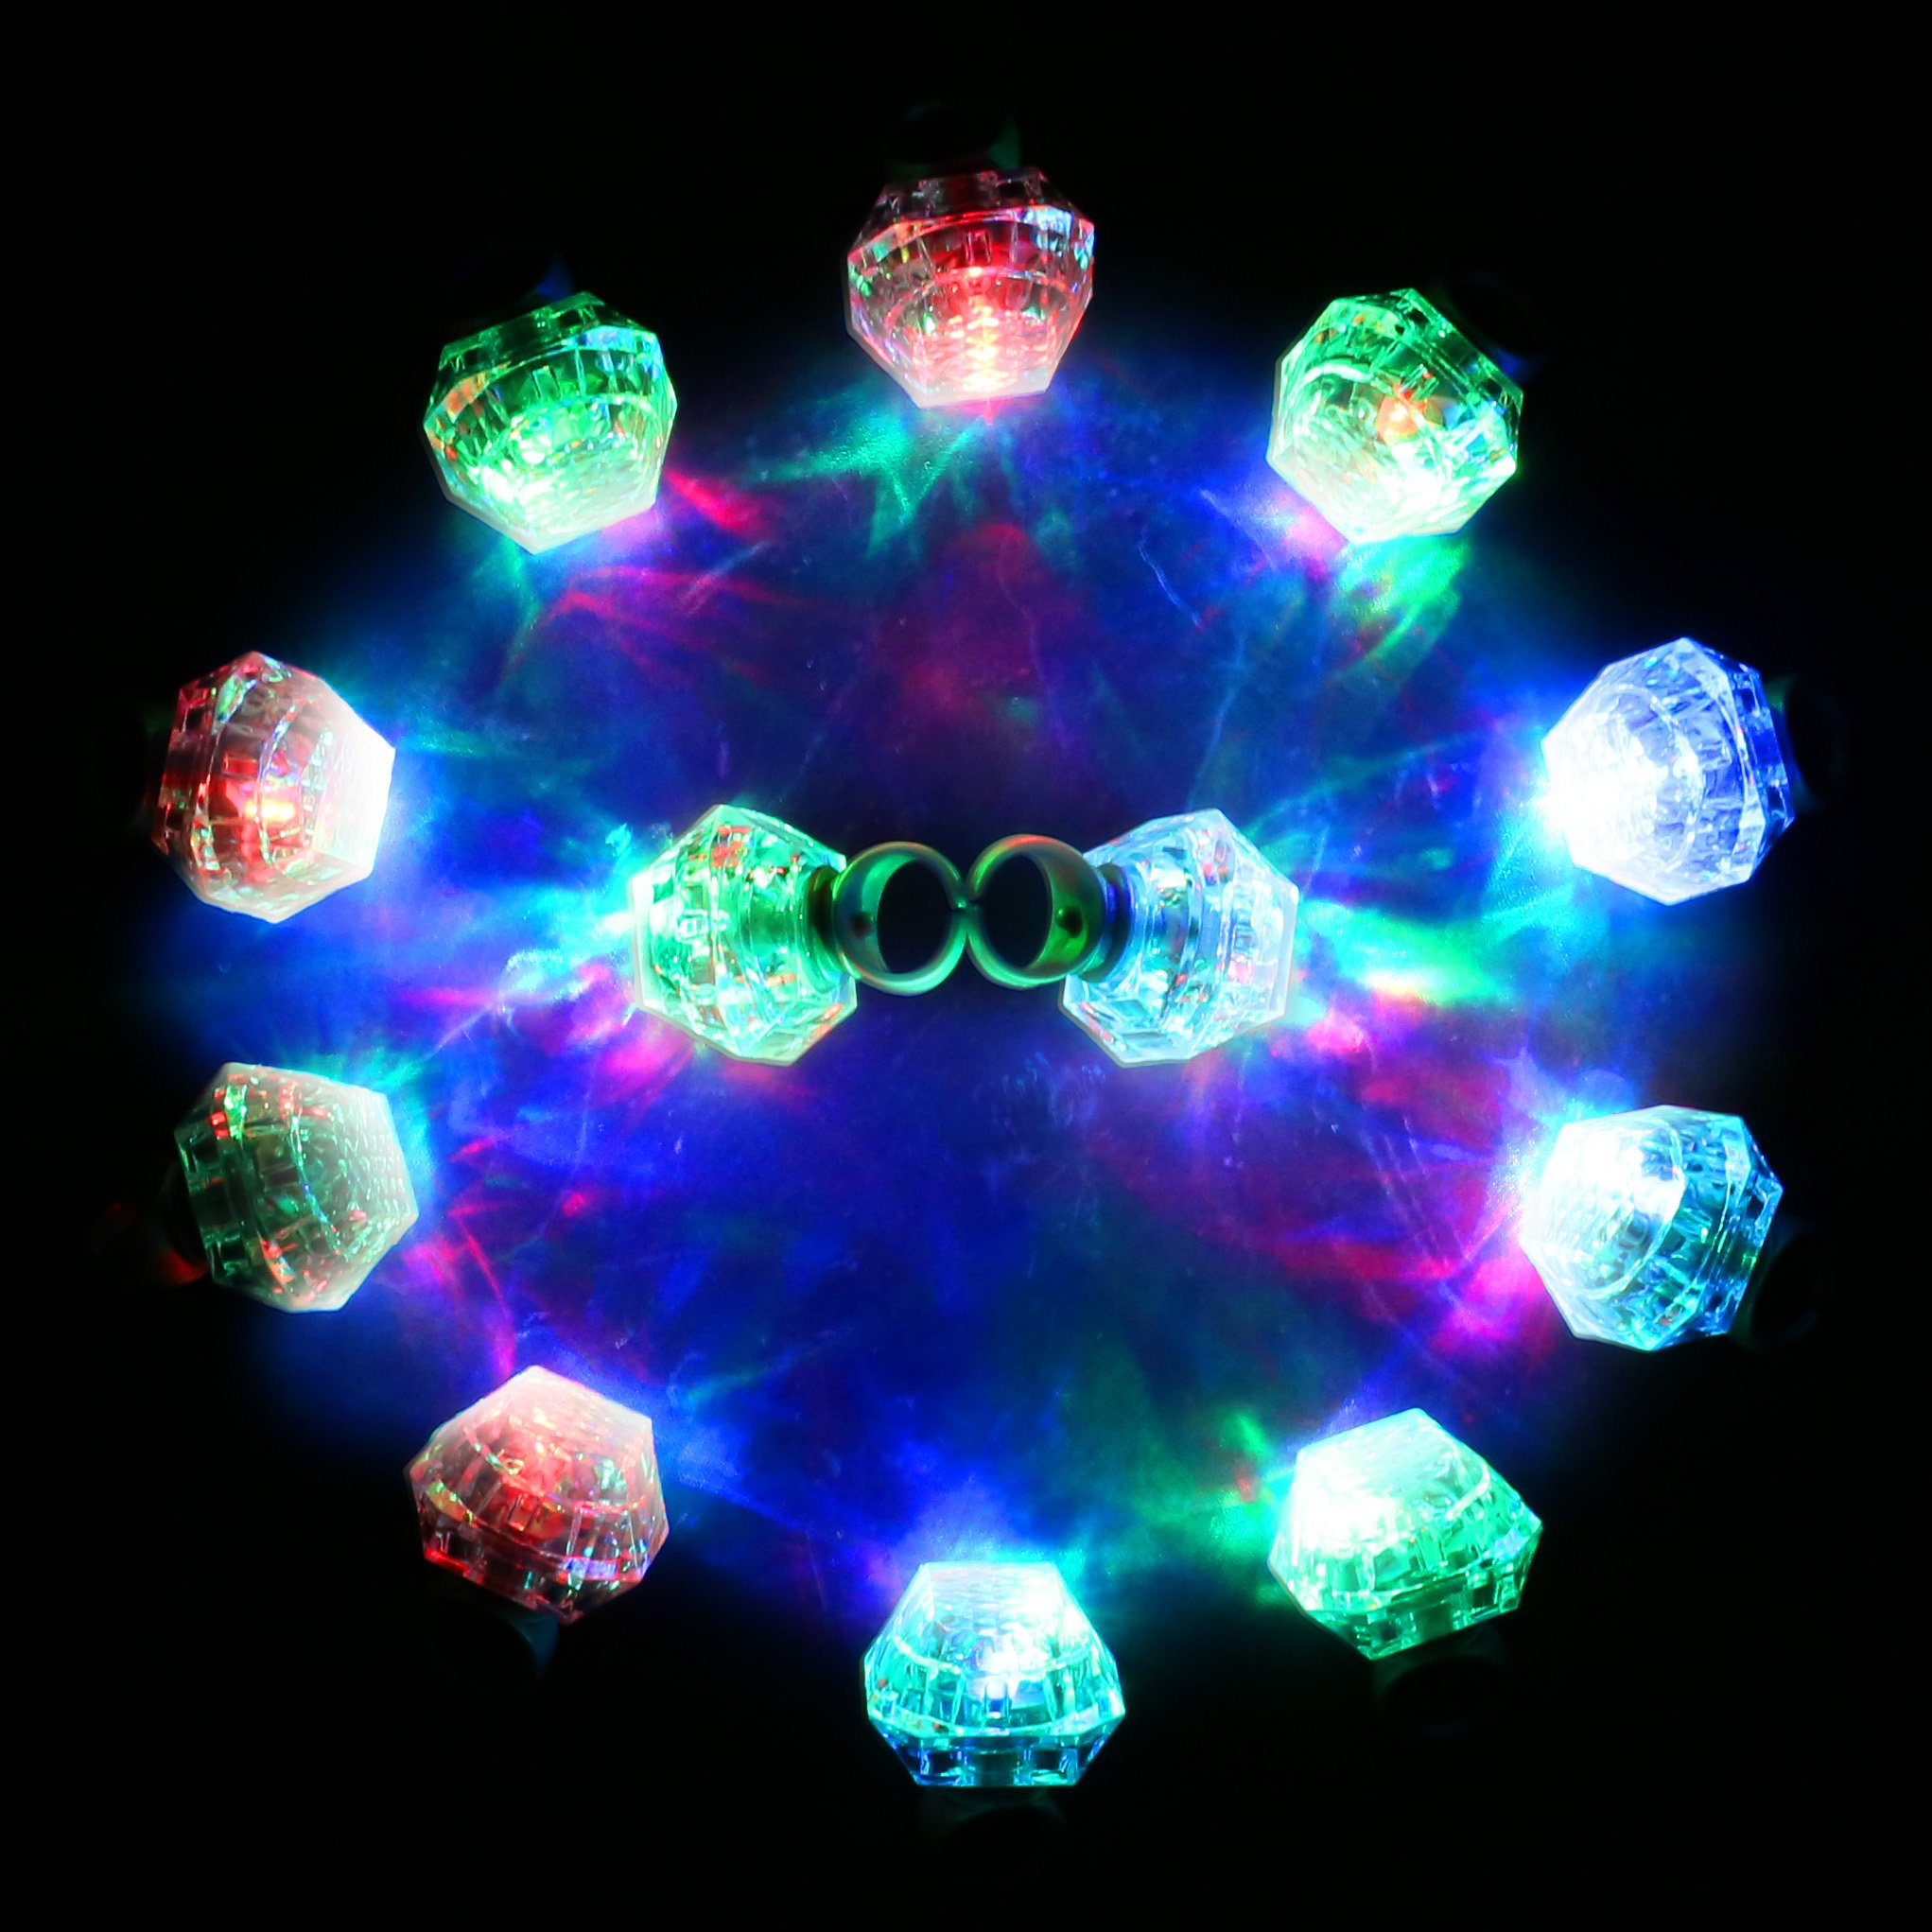 Konsait Flashing Led Light up Ring Toys Diamond Grow in the Dark Jelly Bumpy Rings for Birthday Bachelorette Bridal Shower Gatsby Party Favors (12pcs) by Konsait (Image #4)